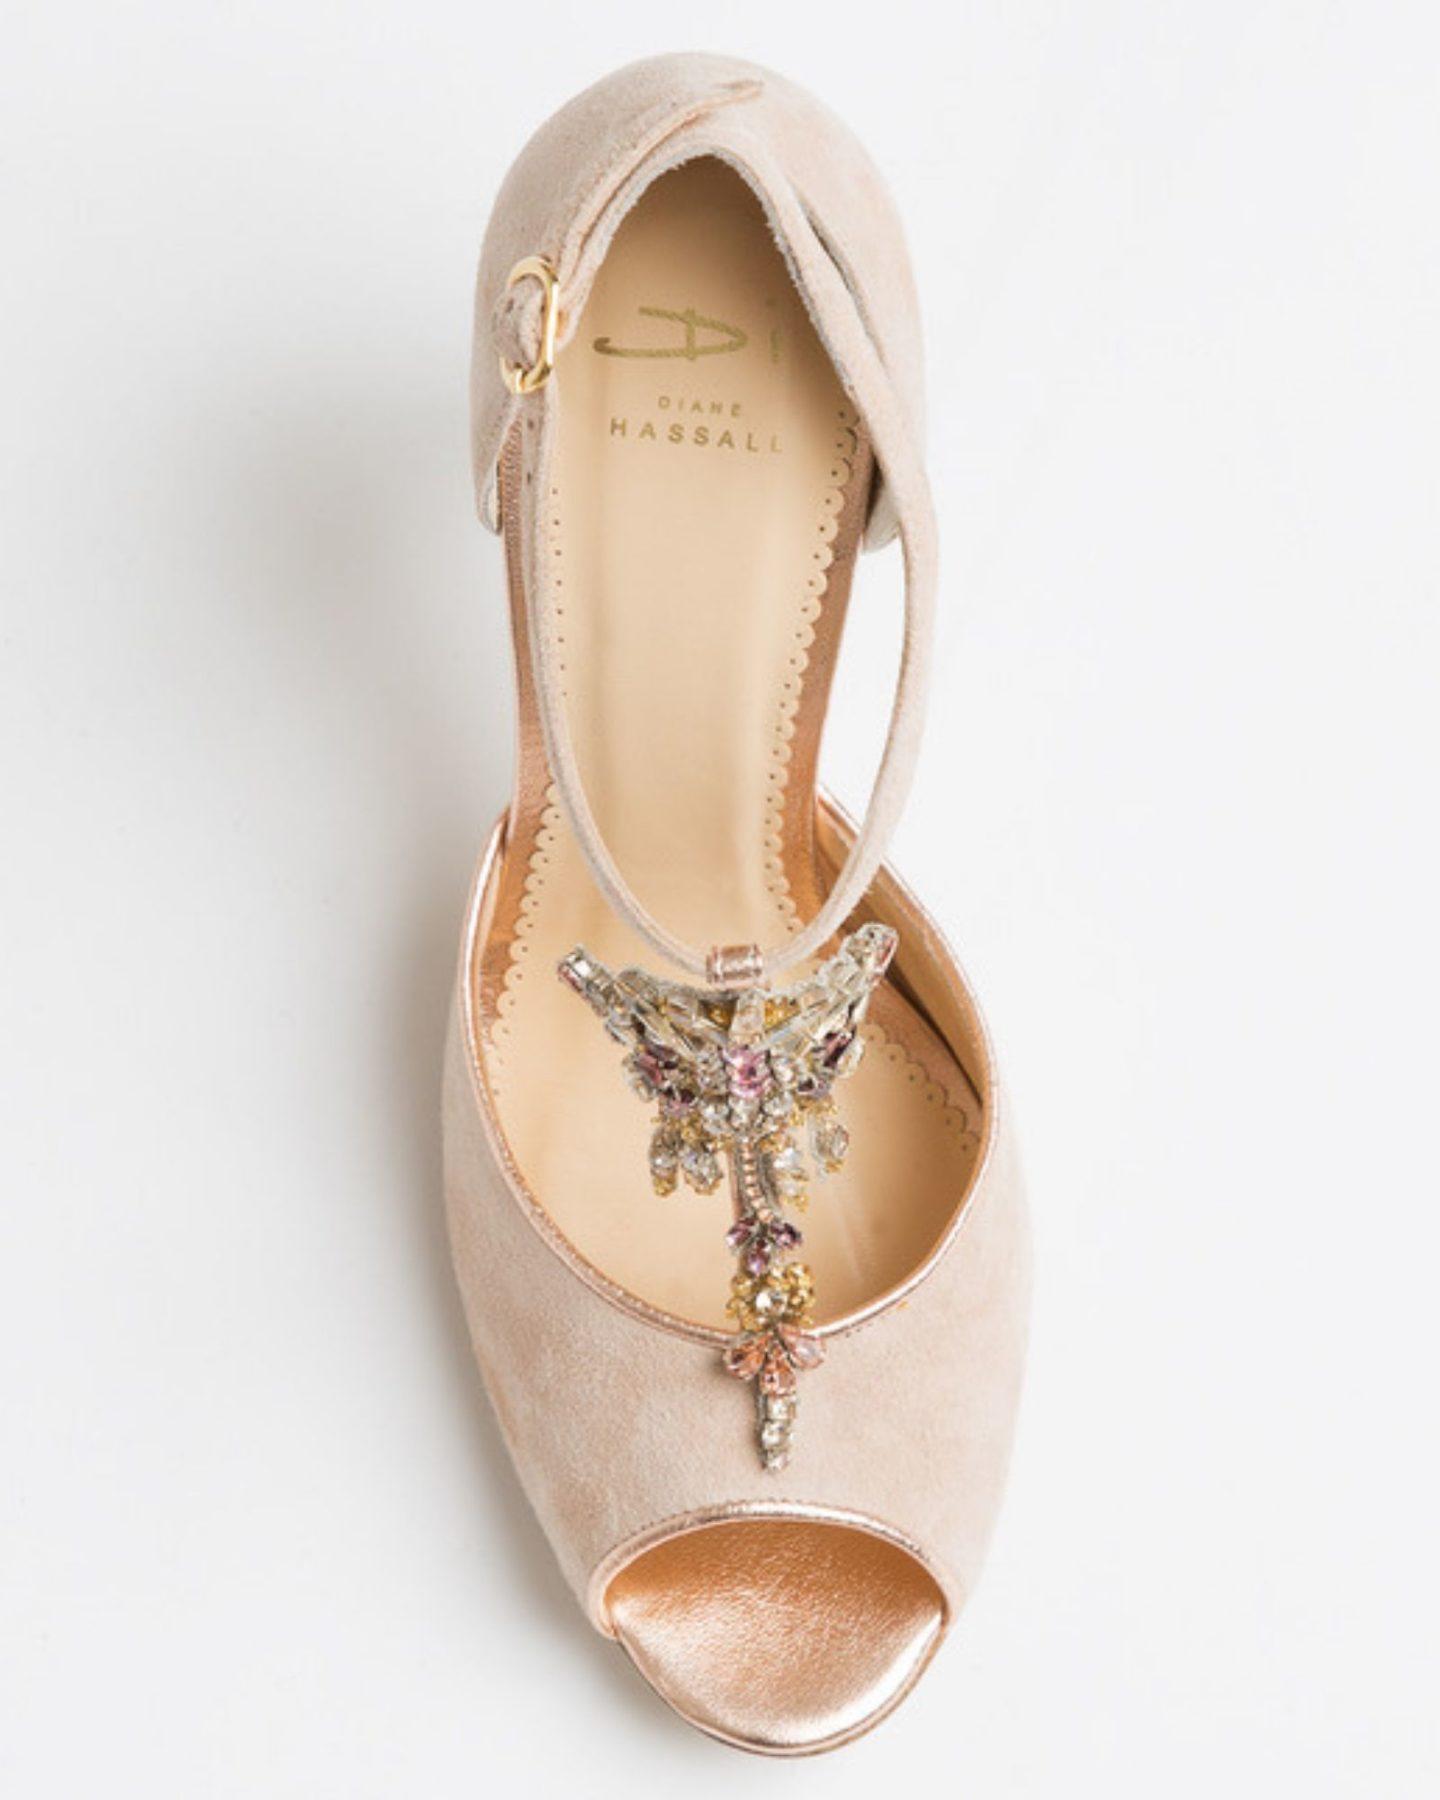 Tutti Frutti vintage and bohemian wedding shoes Boho Bride